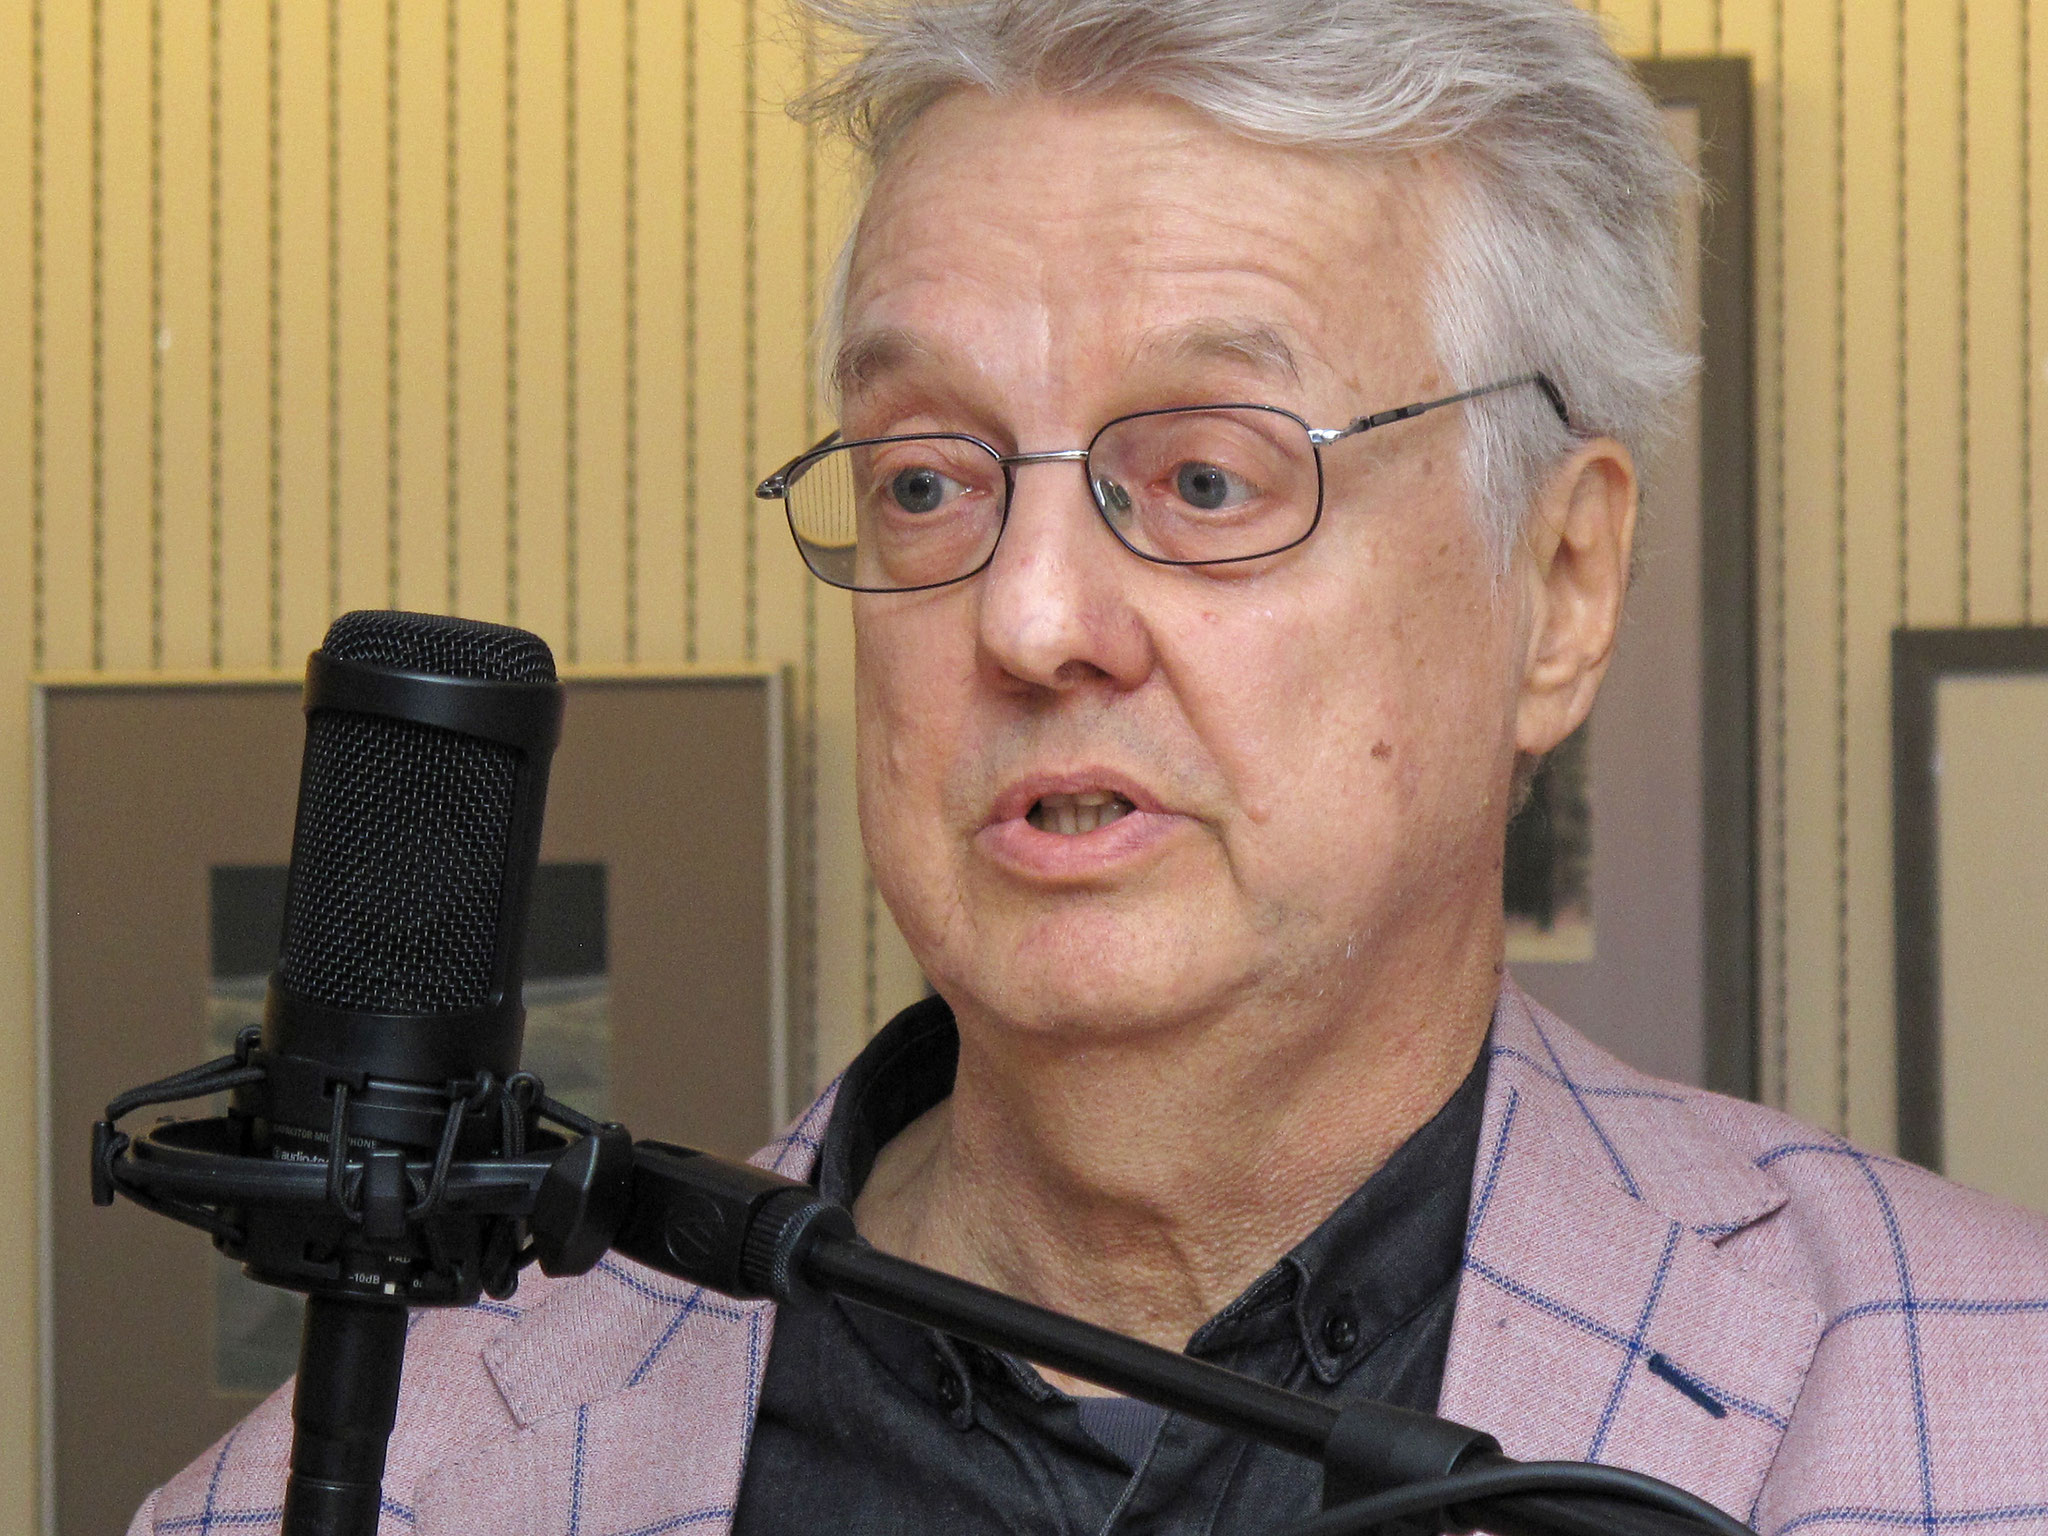 Wolfgang Hoyer, Märchenerzähler